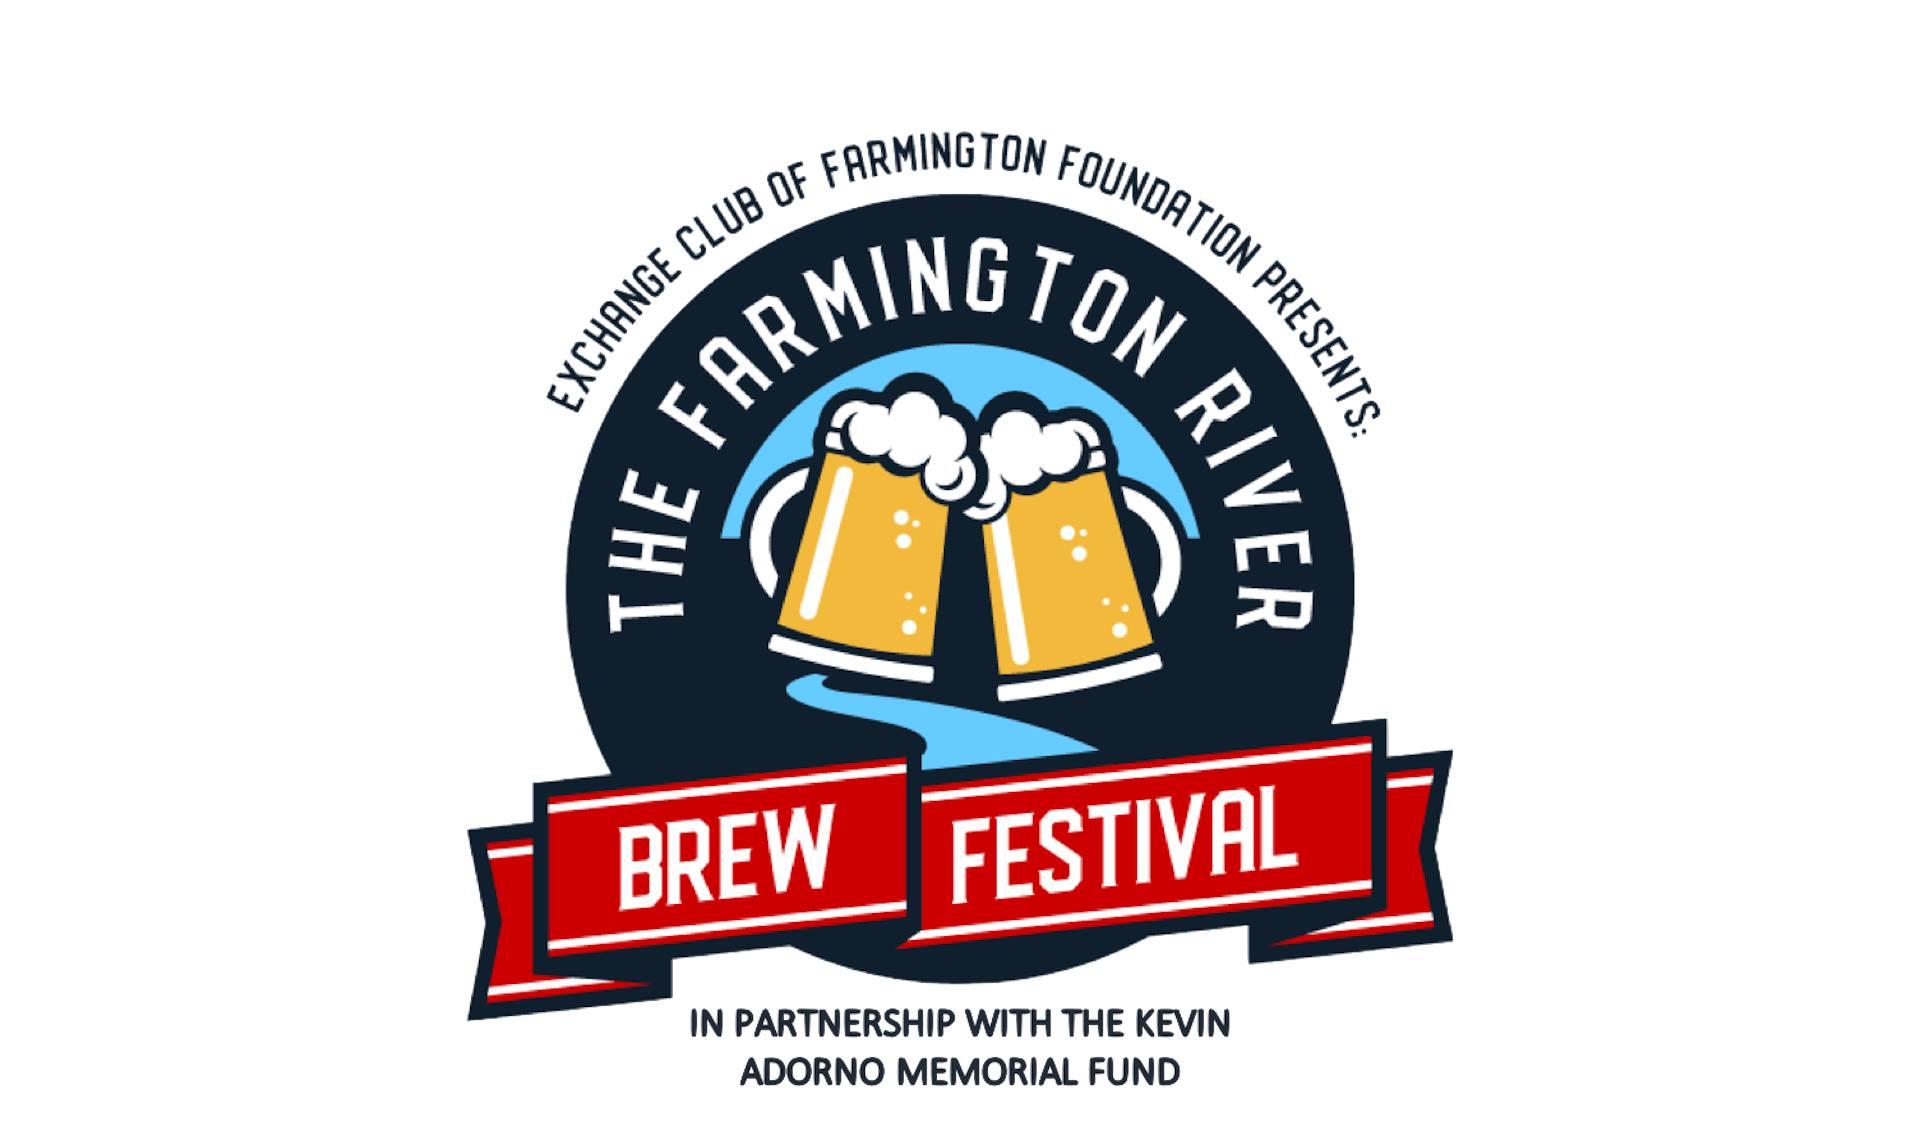 farmington river brew festival.jpg